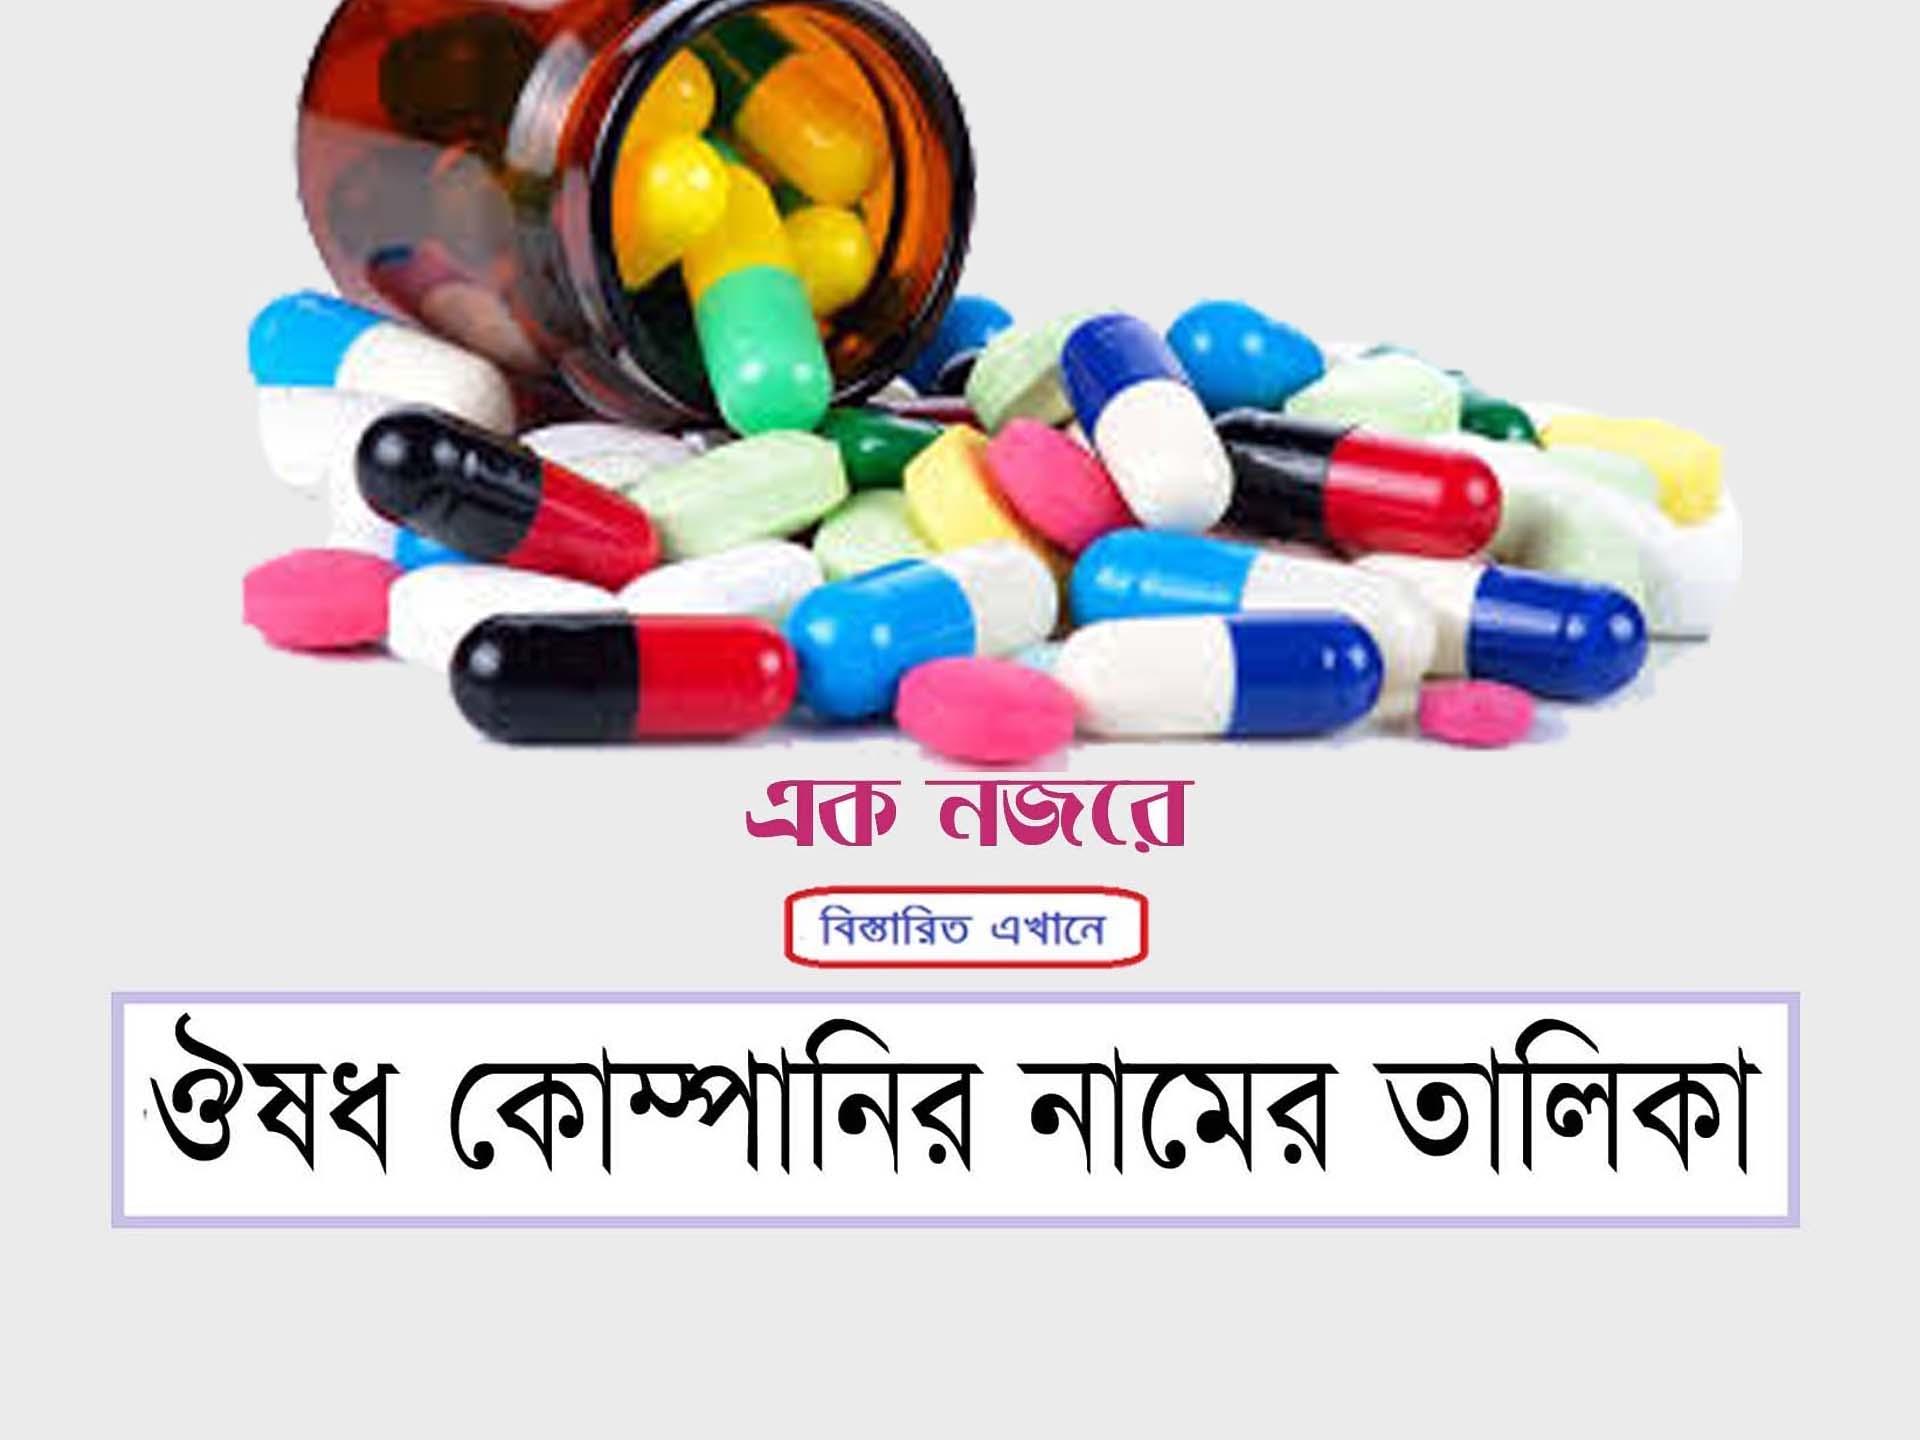 Medicine company name list -ঔষধ কোম্পানির তালিকা